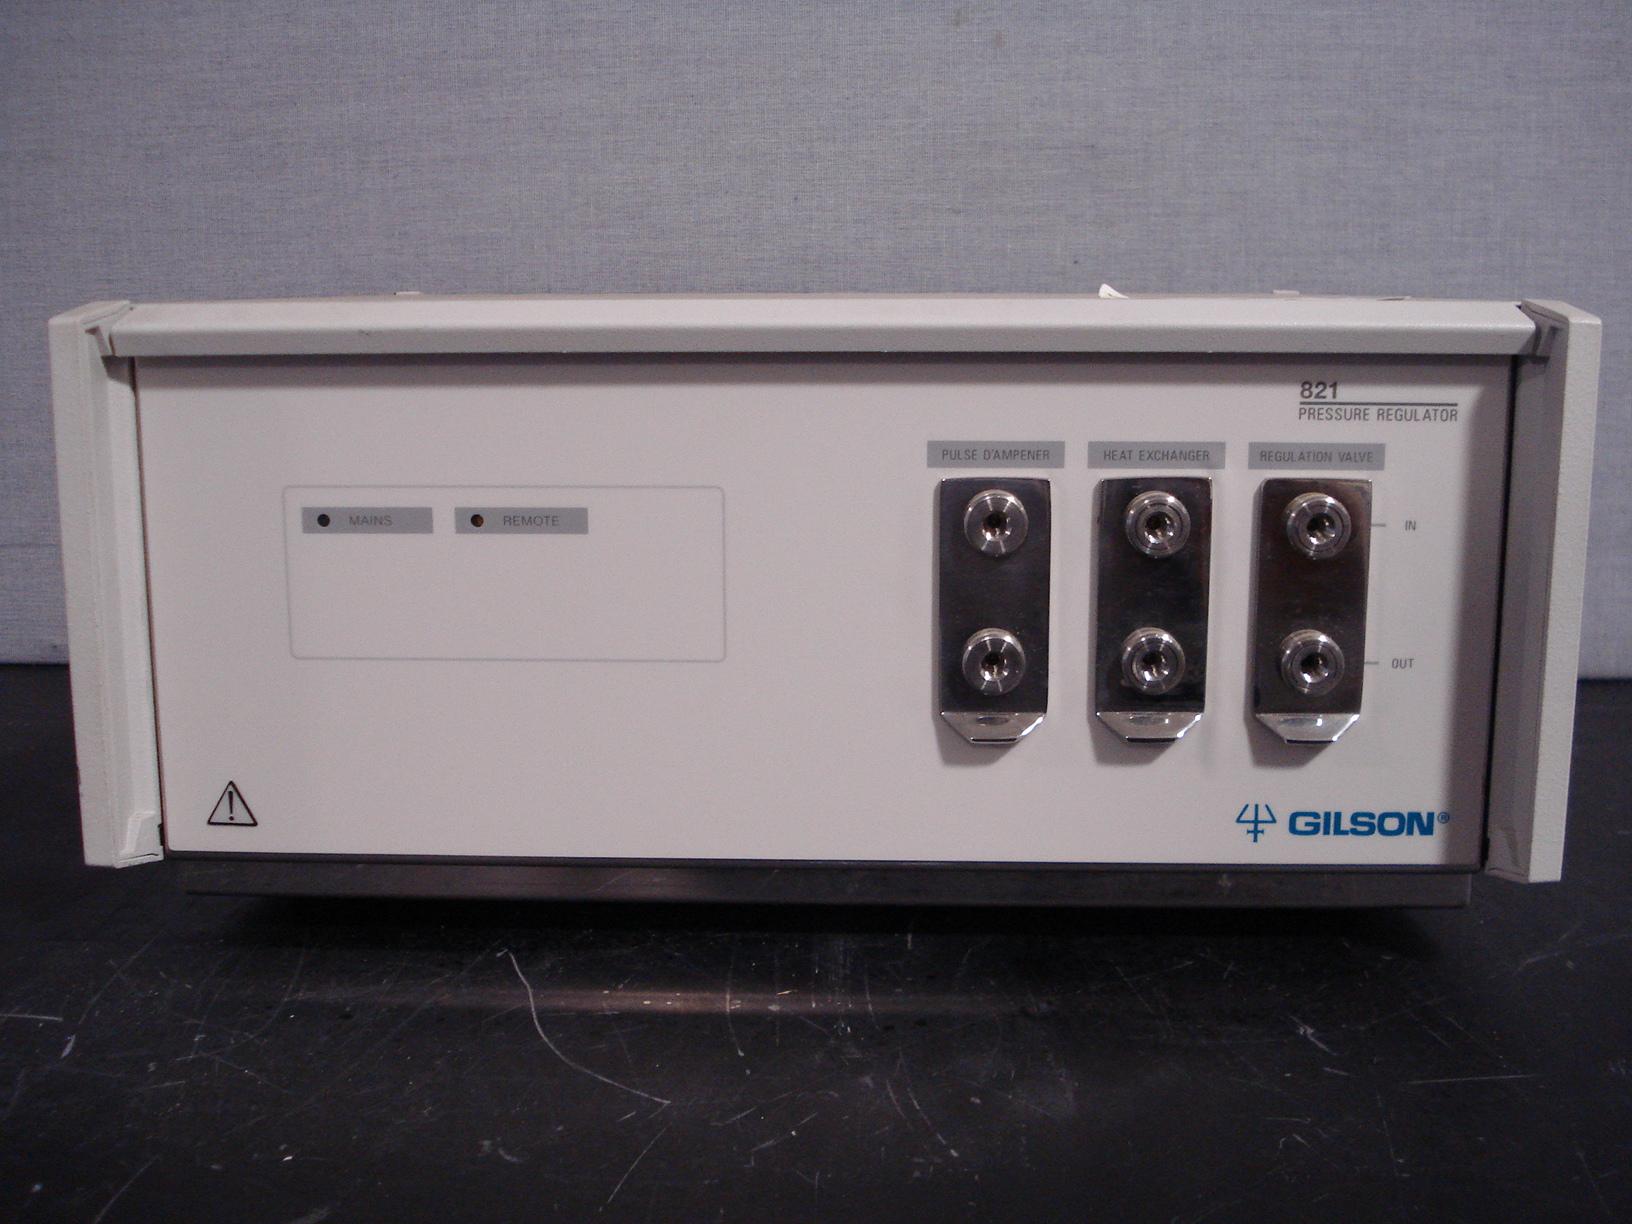 Gilson Pressure Regulator Model 821 Image